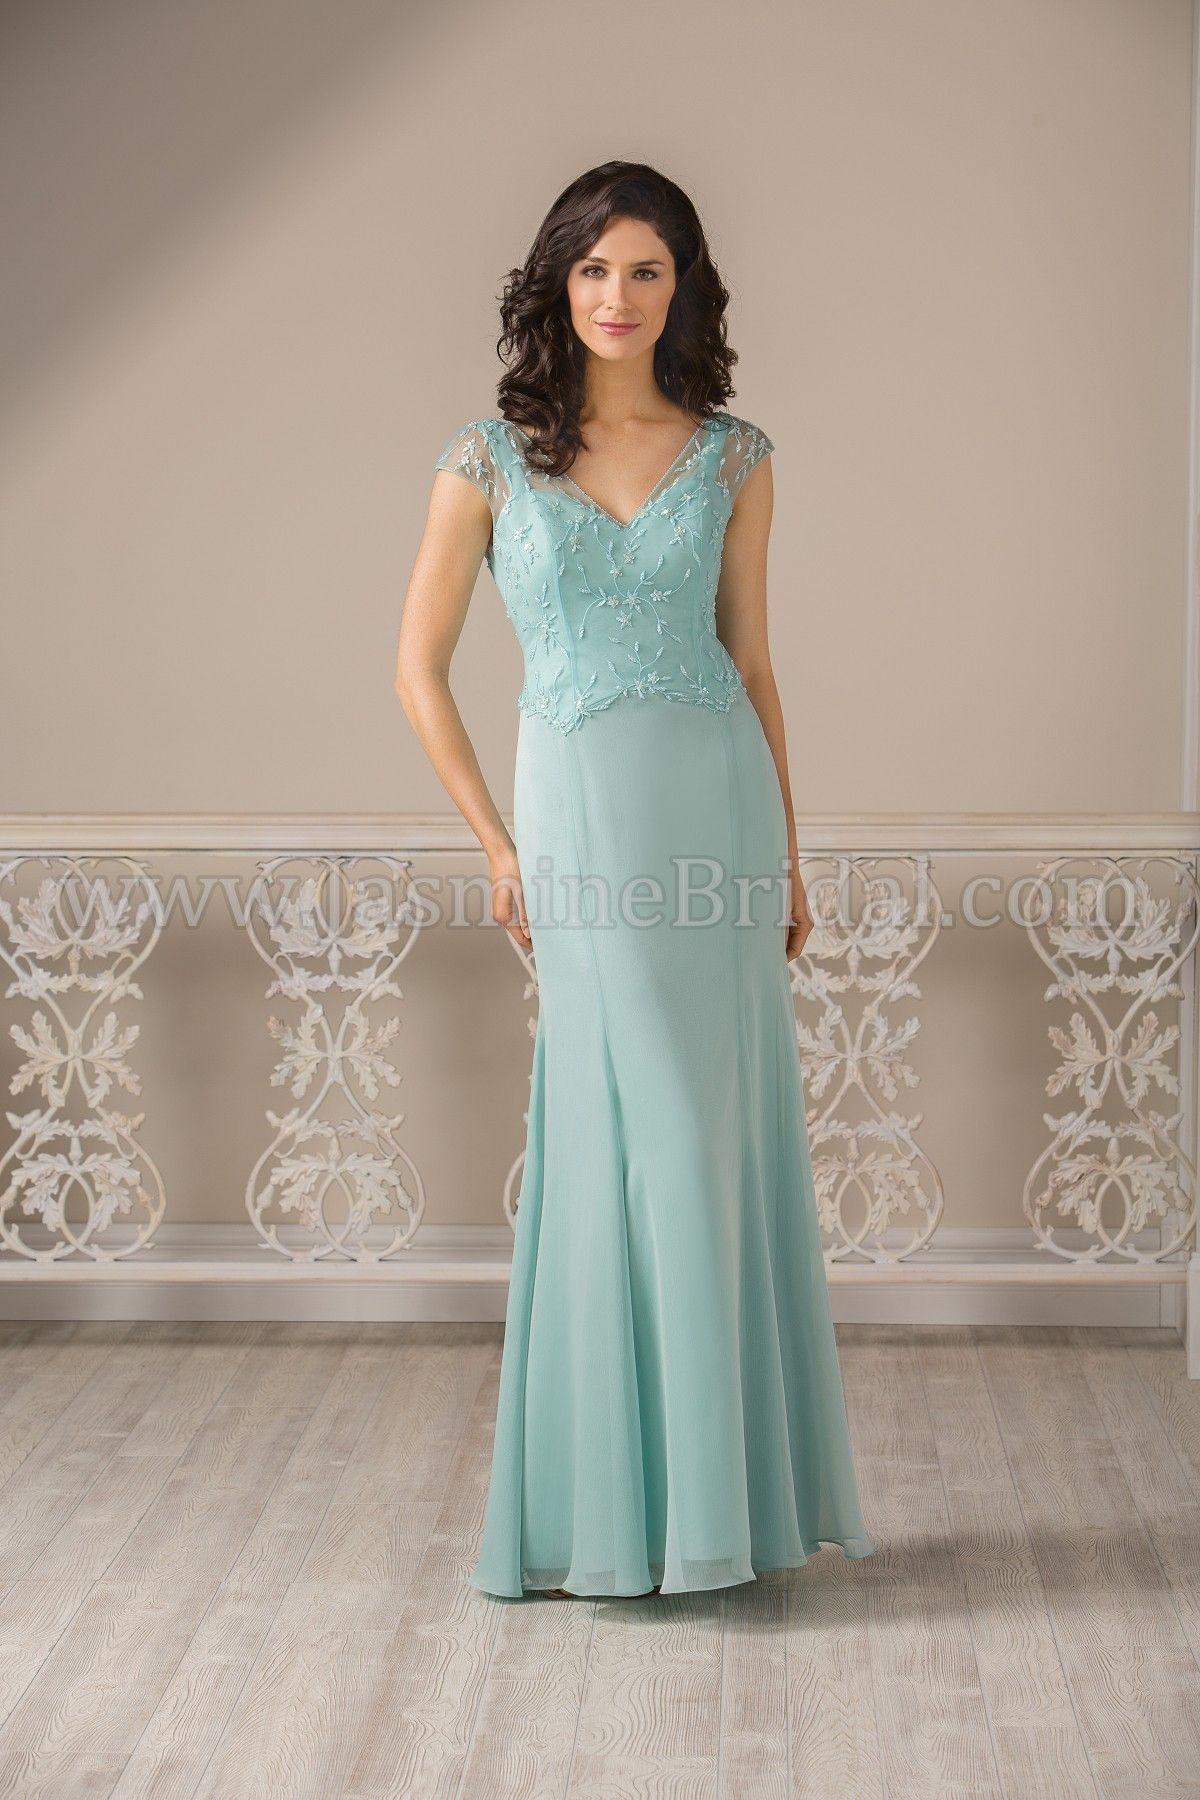 Fine Wedding Dress For Mom Model - All Wedding Dresses ...